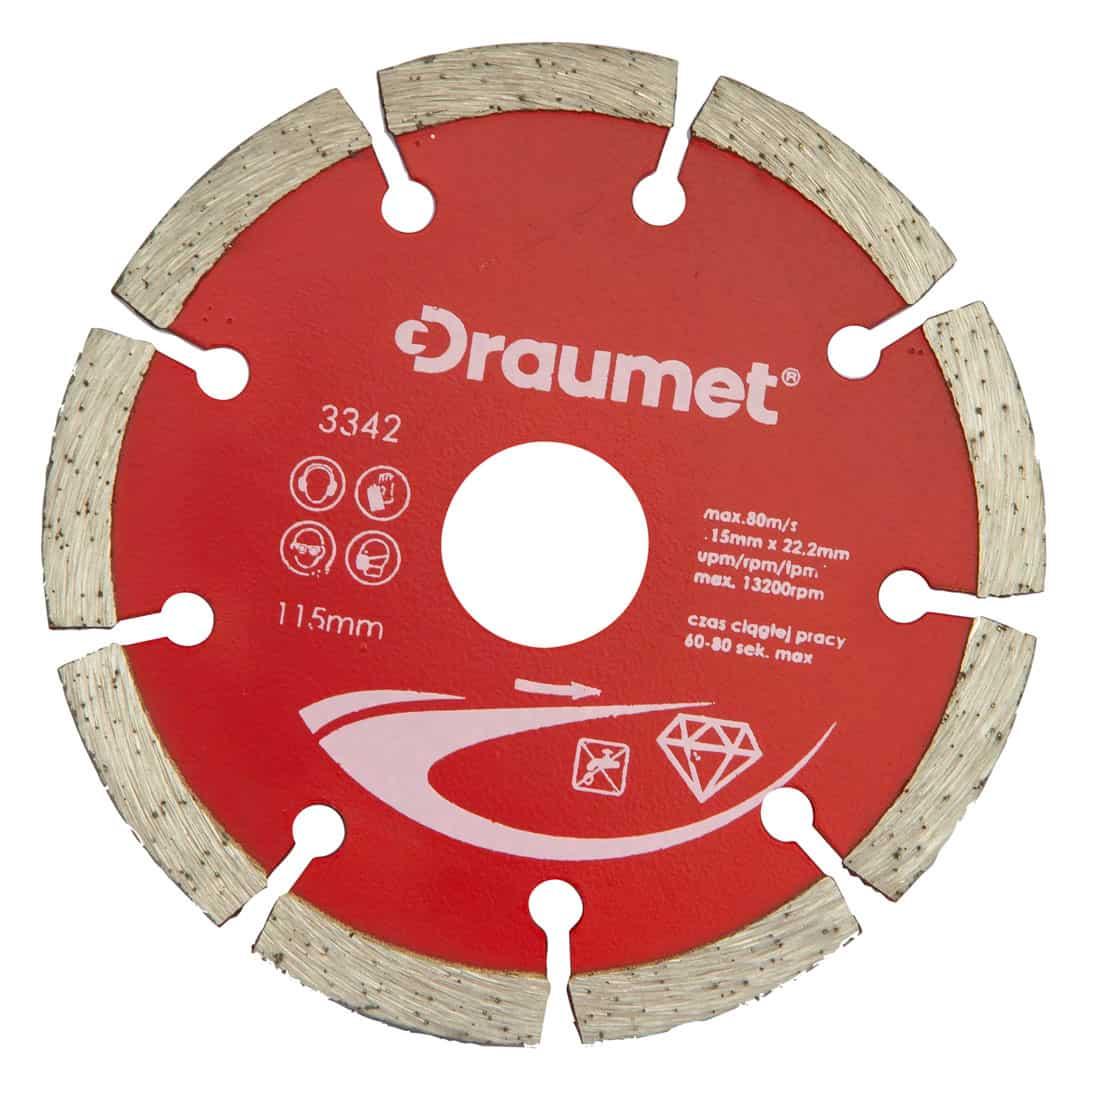 Draumet_3342-1